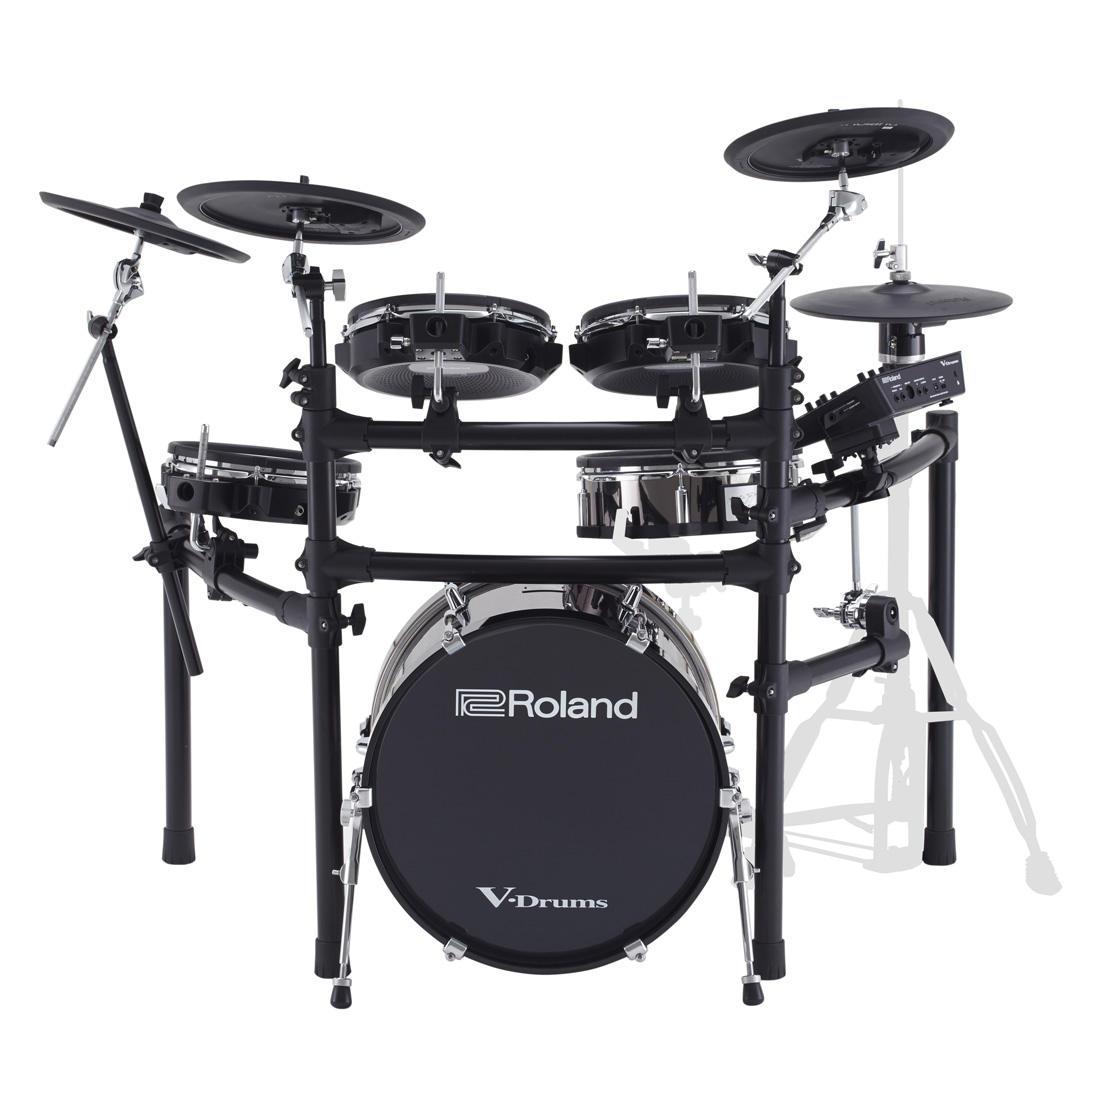 Roland Drum System TD-25KVX スタンダードセット /HHスタンドとSDスタンド別【YRK】【10000円キャッシュバックWキャンペーン対象商品】